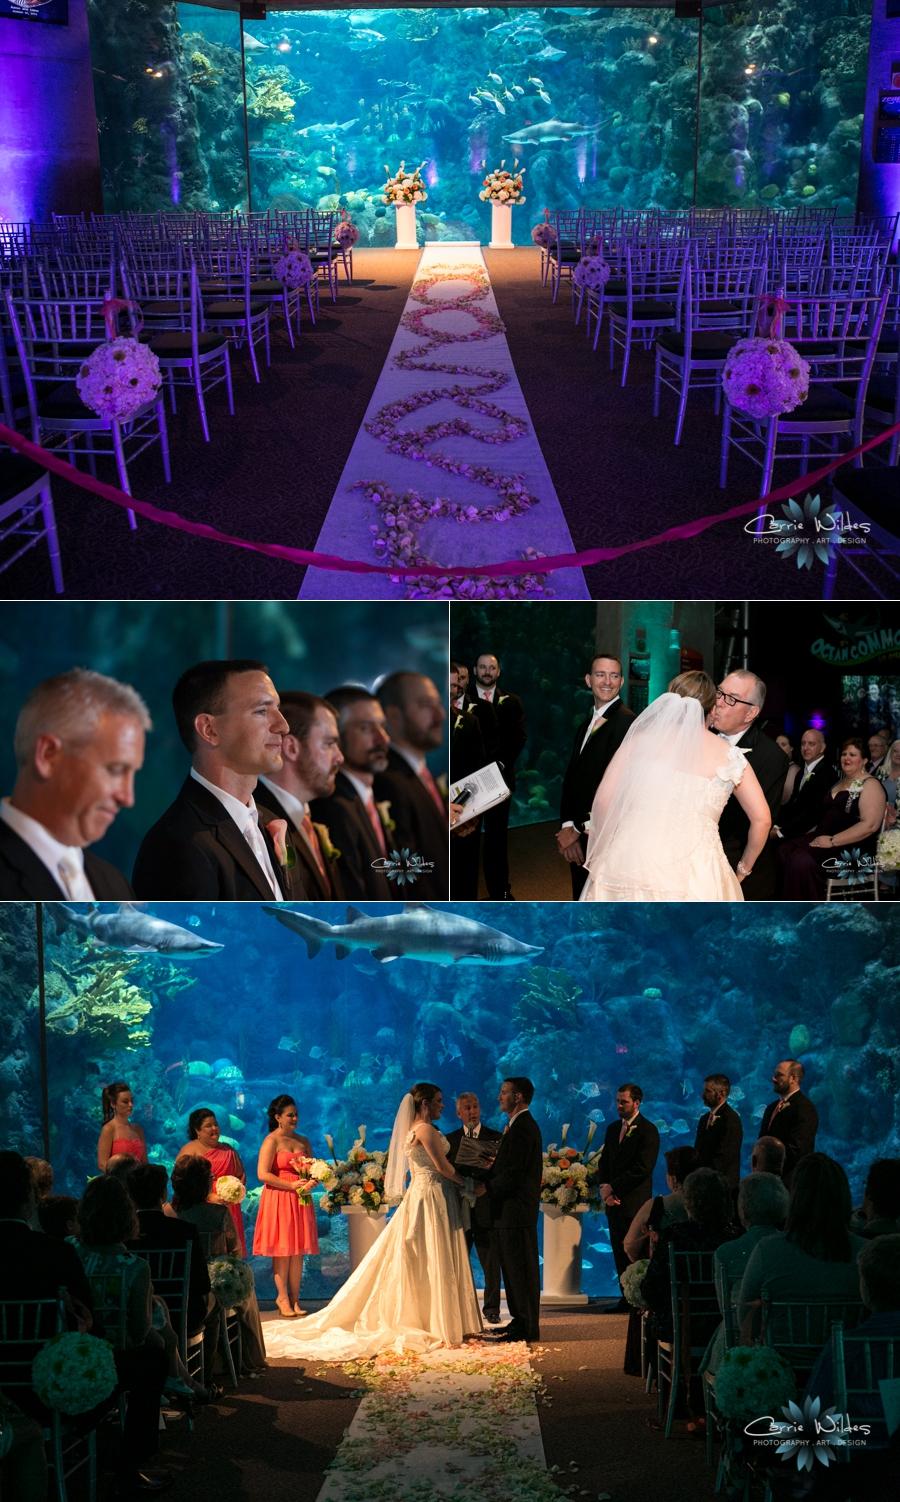 10_12_13 Florida Aquarium Wedding_0006.jpg